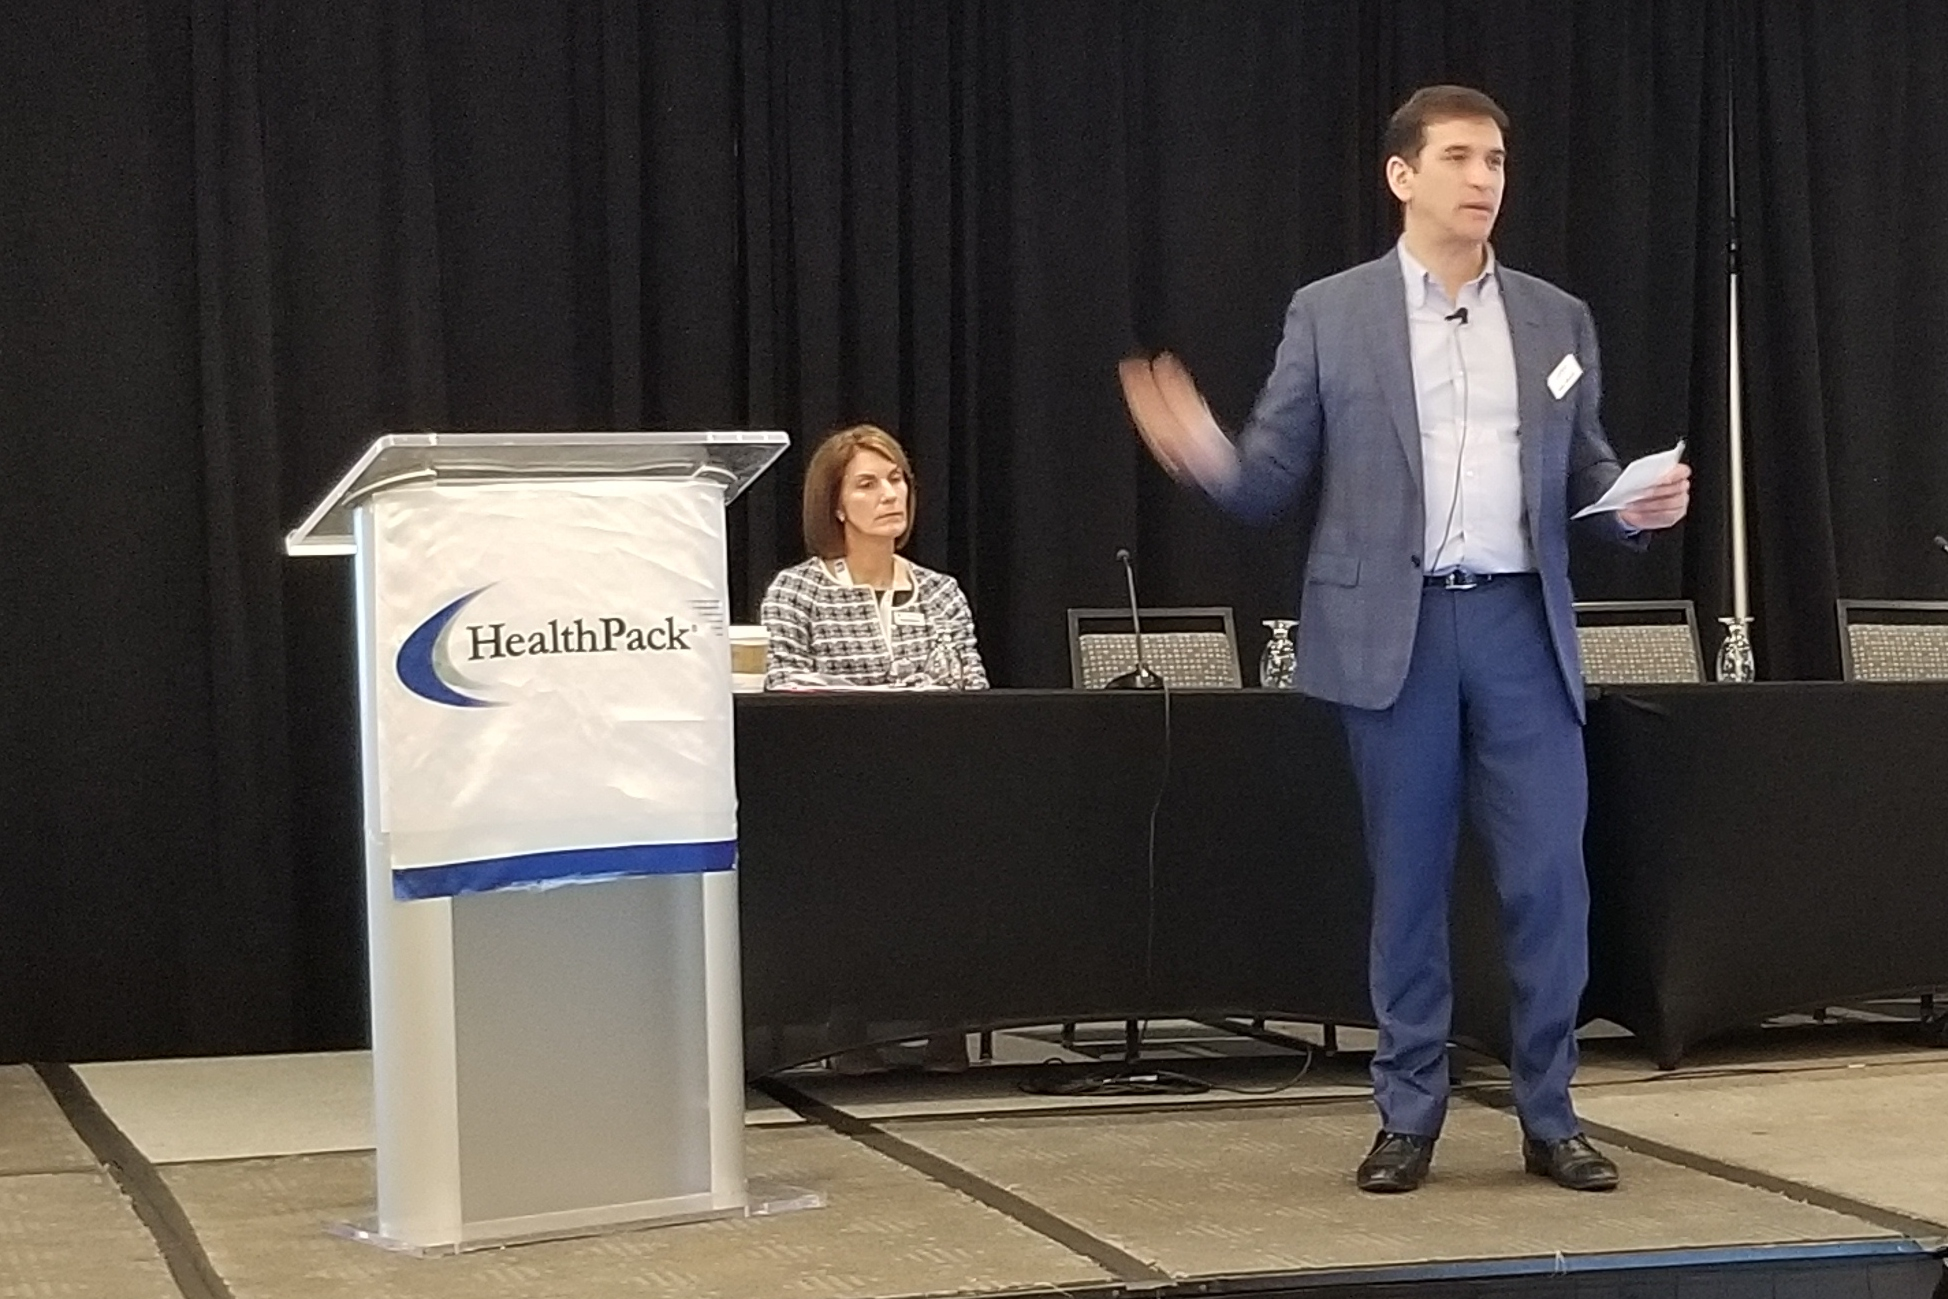 Speaker next to podium at HealthPack 2020